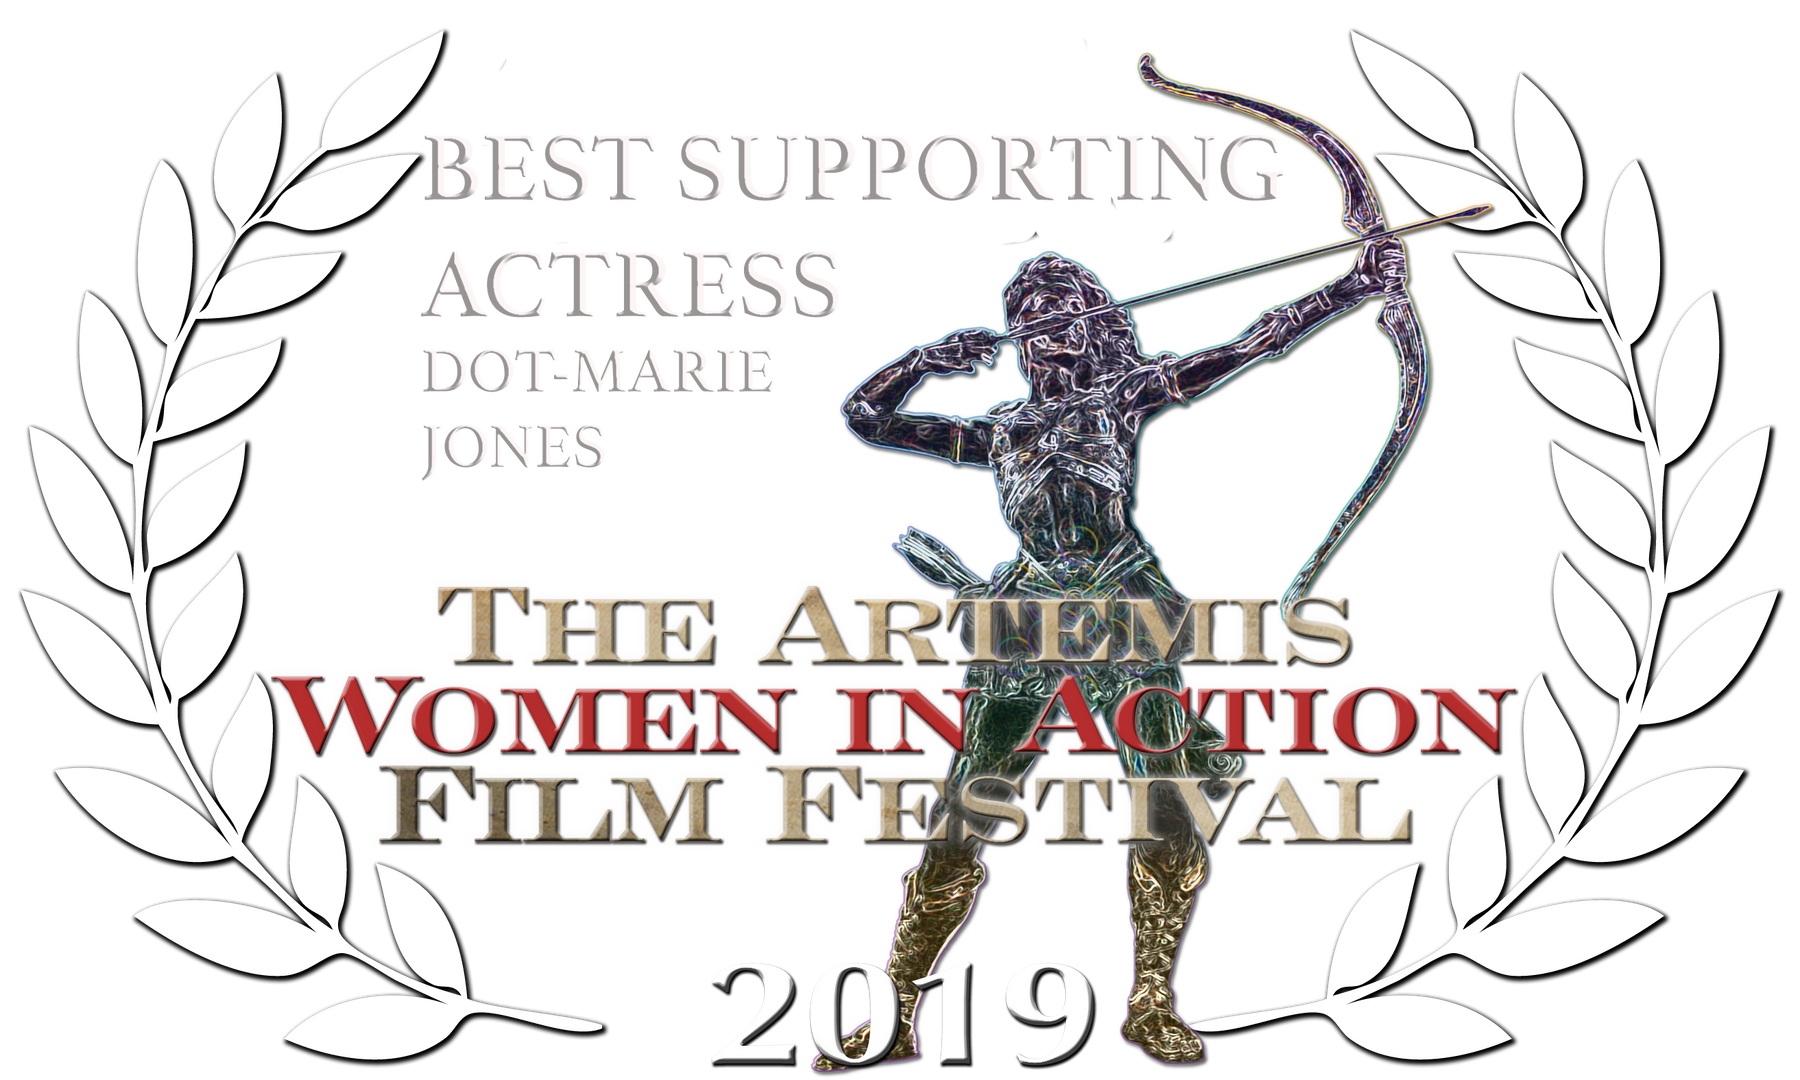 2019 AWIAFF Best Sup Actress laurels wht